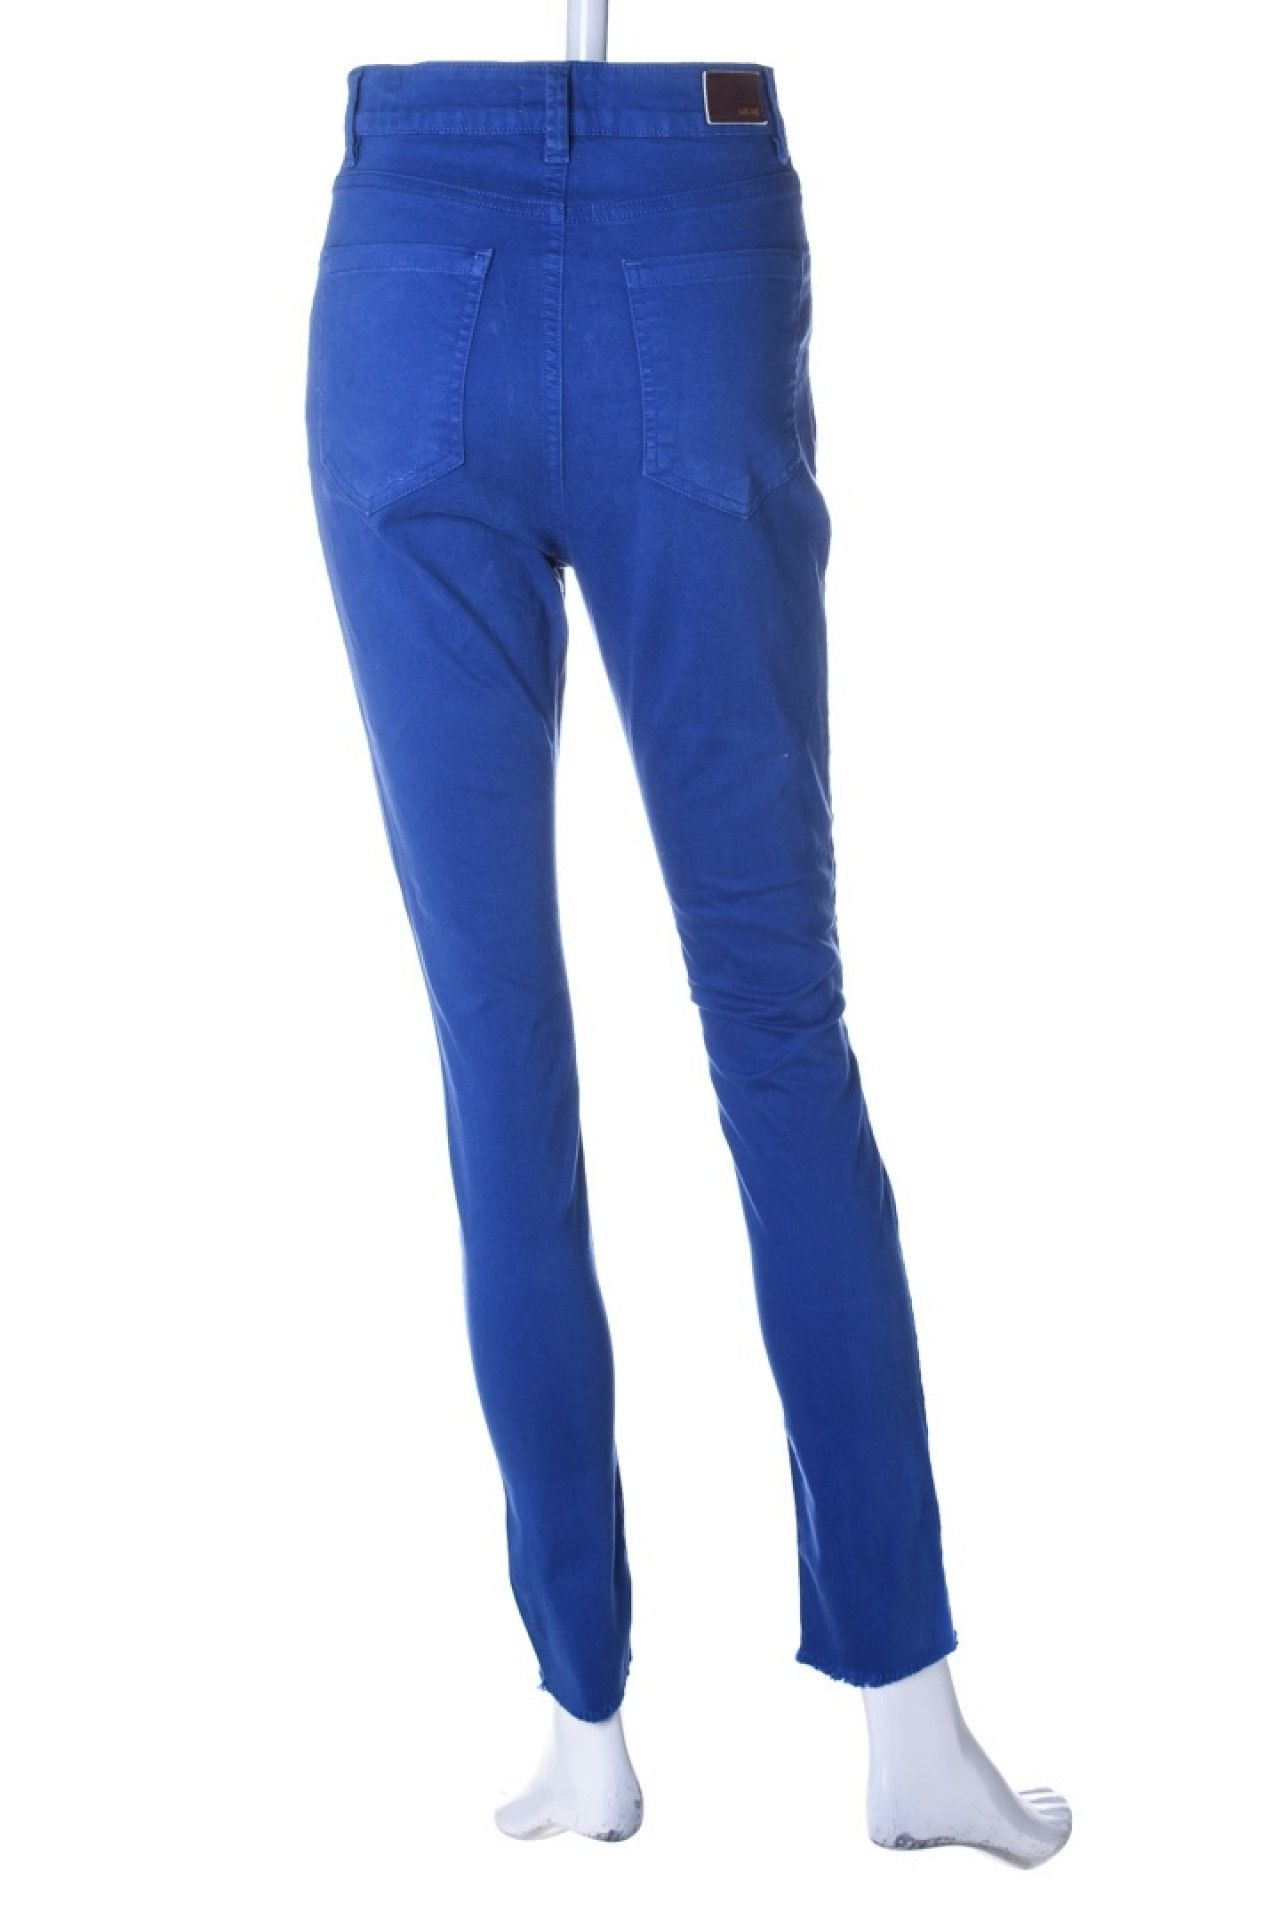 A.brand - Calça Skinny Azul  - Foto 2